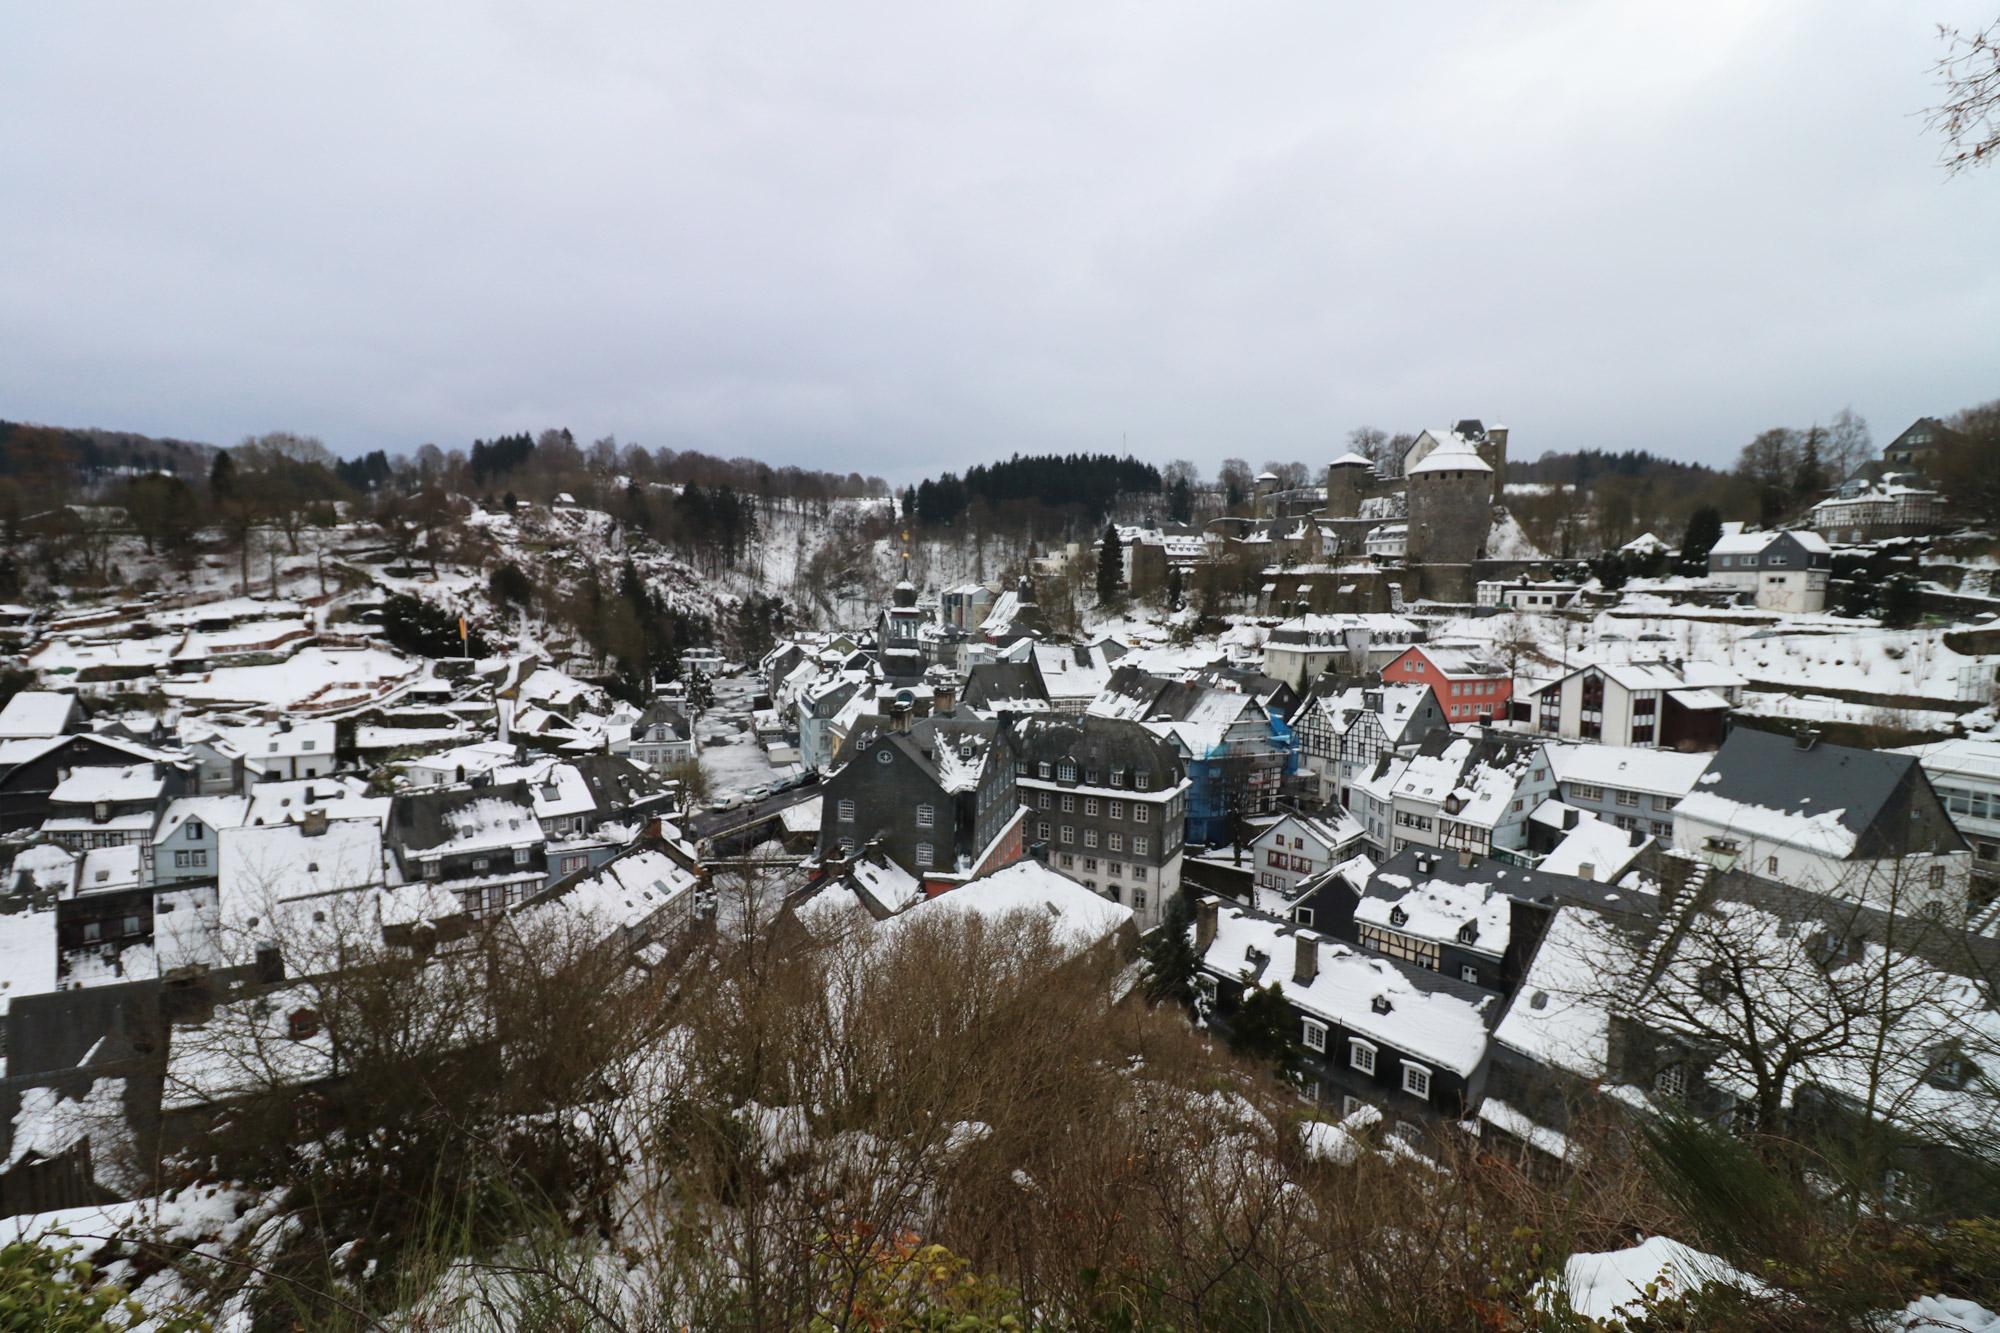 Stedentrip Monschau - Uitzicht vanaf de Haller Ruïne